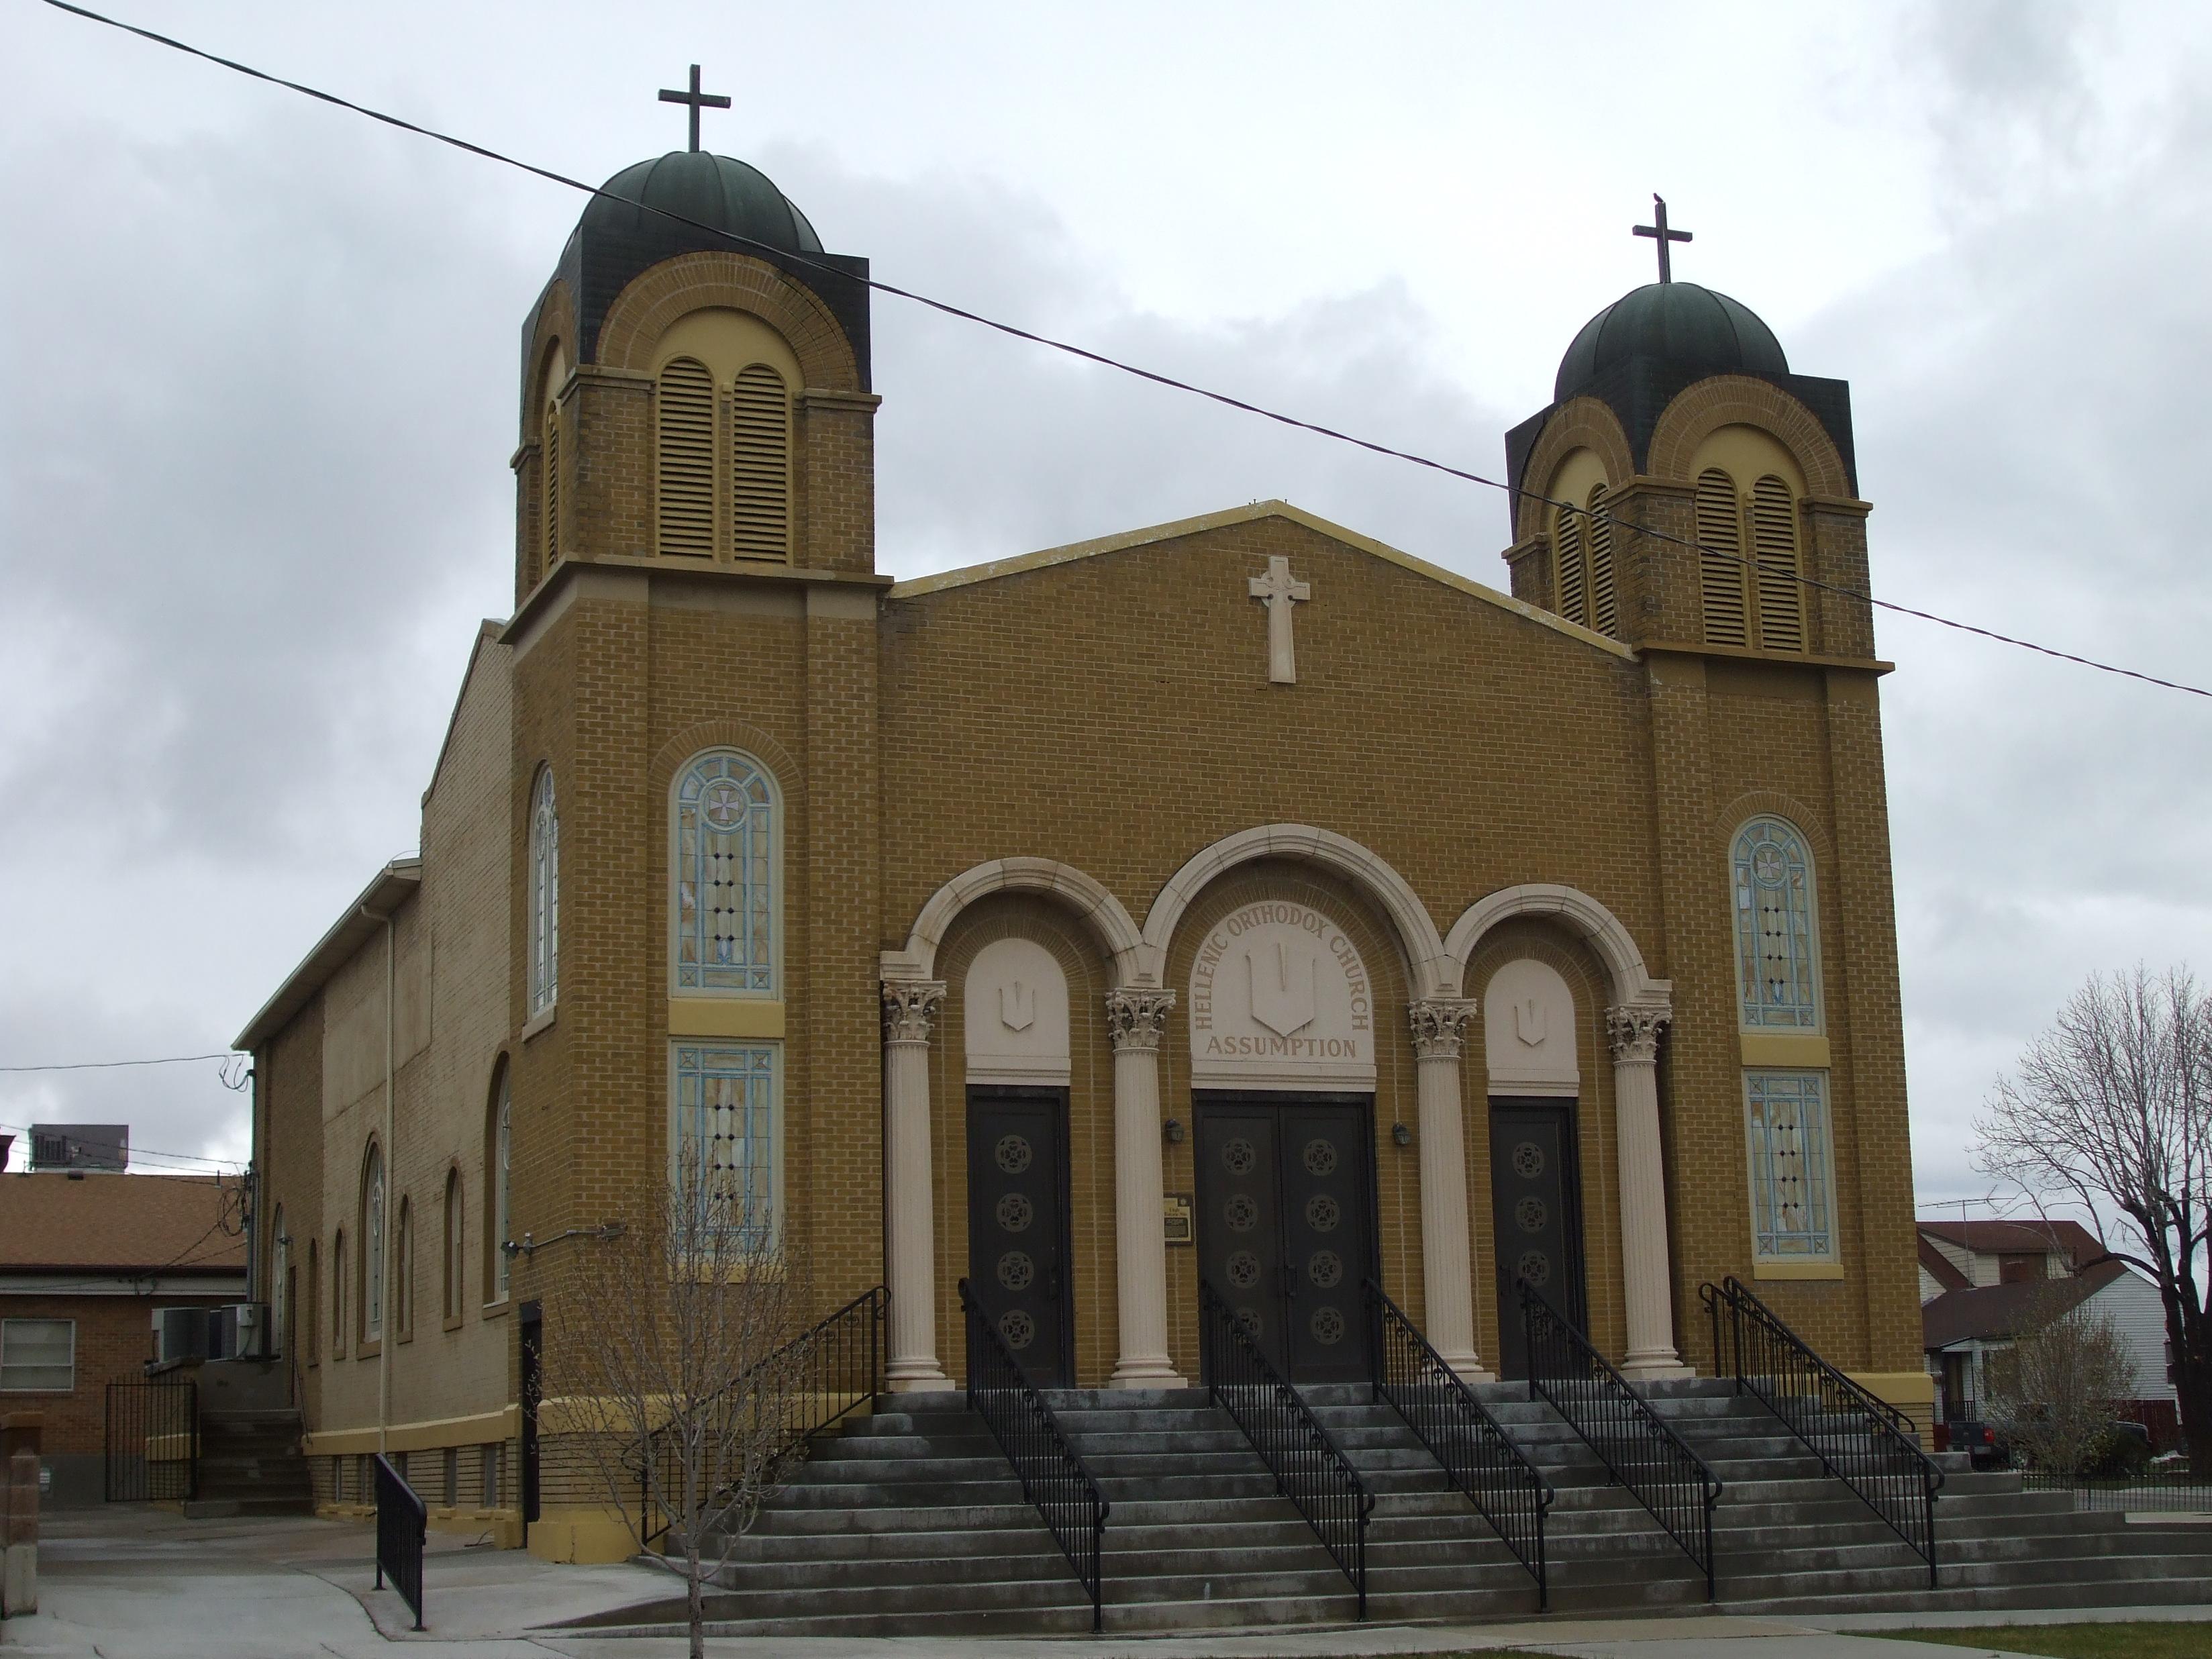 http://upload.wikimedia.org/wikipedia/commons/6/65/Orthodox_Church_Price_Utah.jpeg